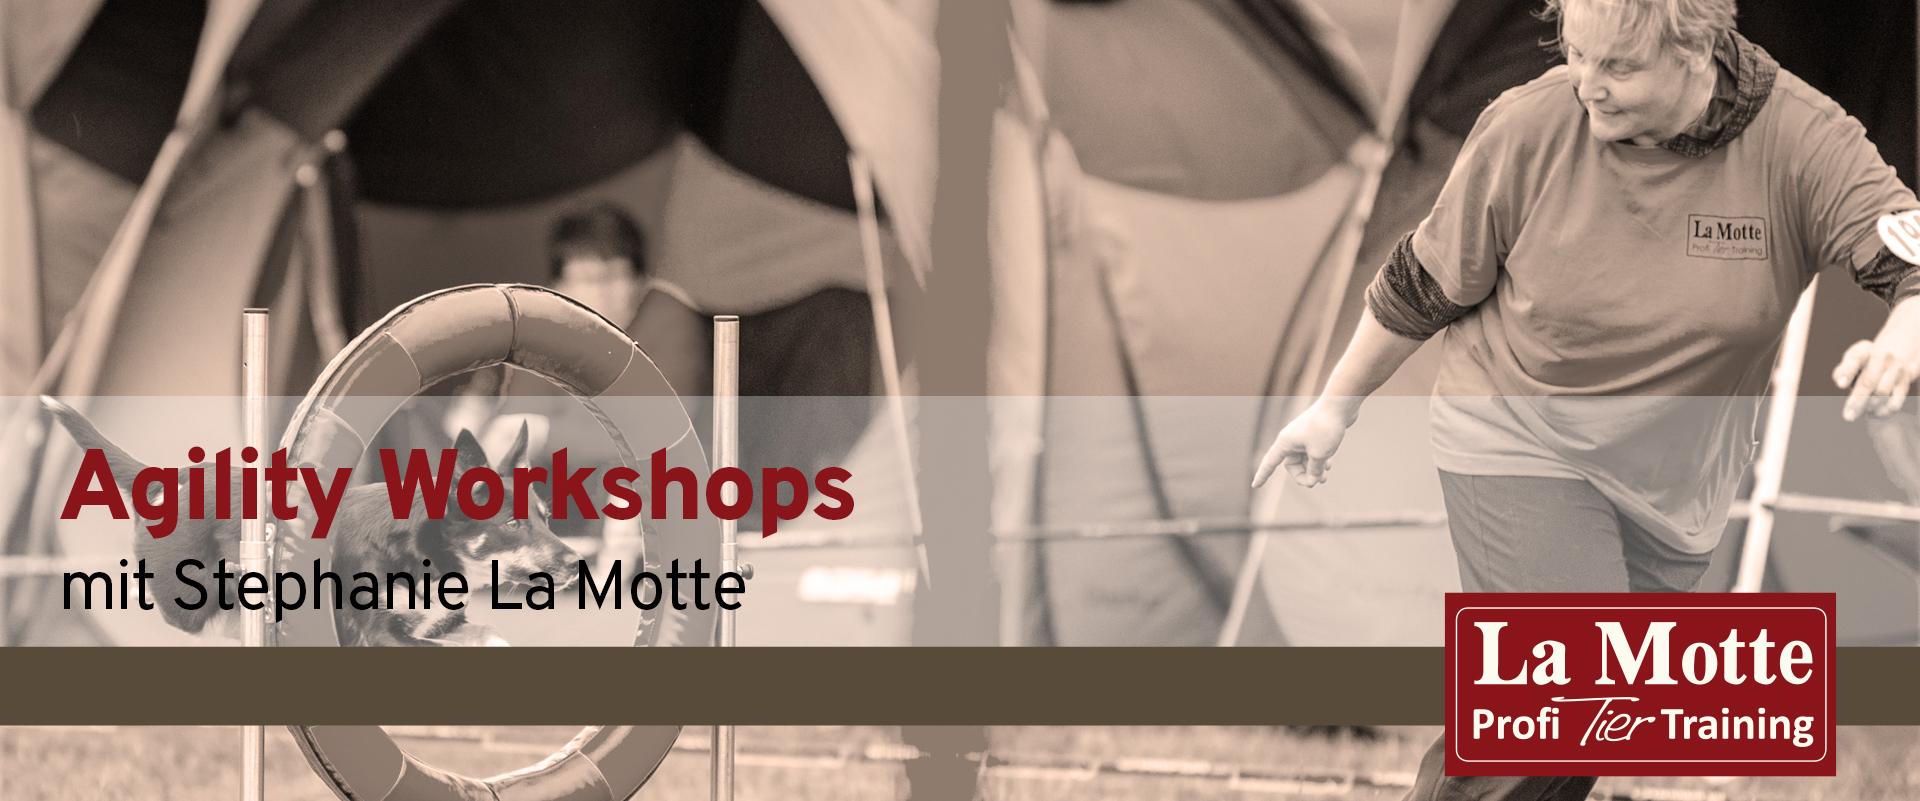 Agility Workshops mit Stephanie La Motte - Teil 2